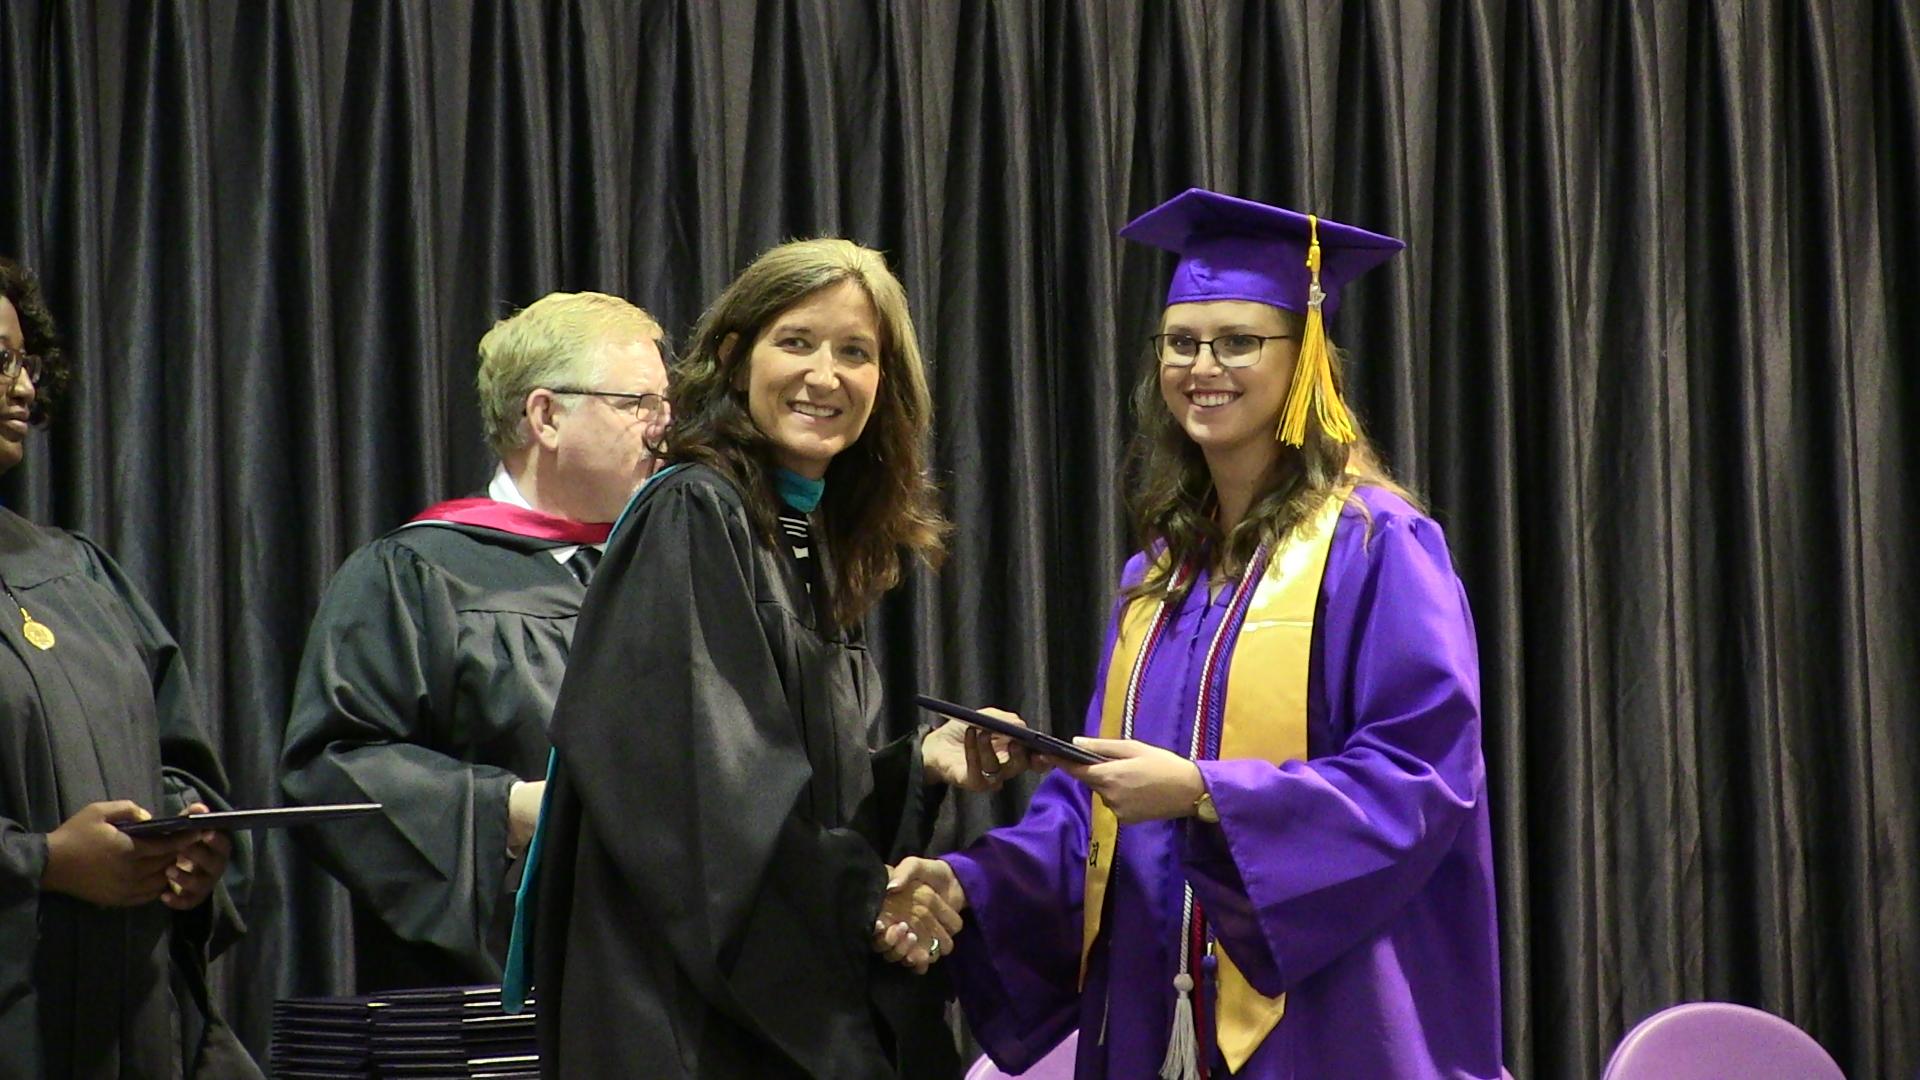 West Bladen Graduation 2